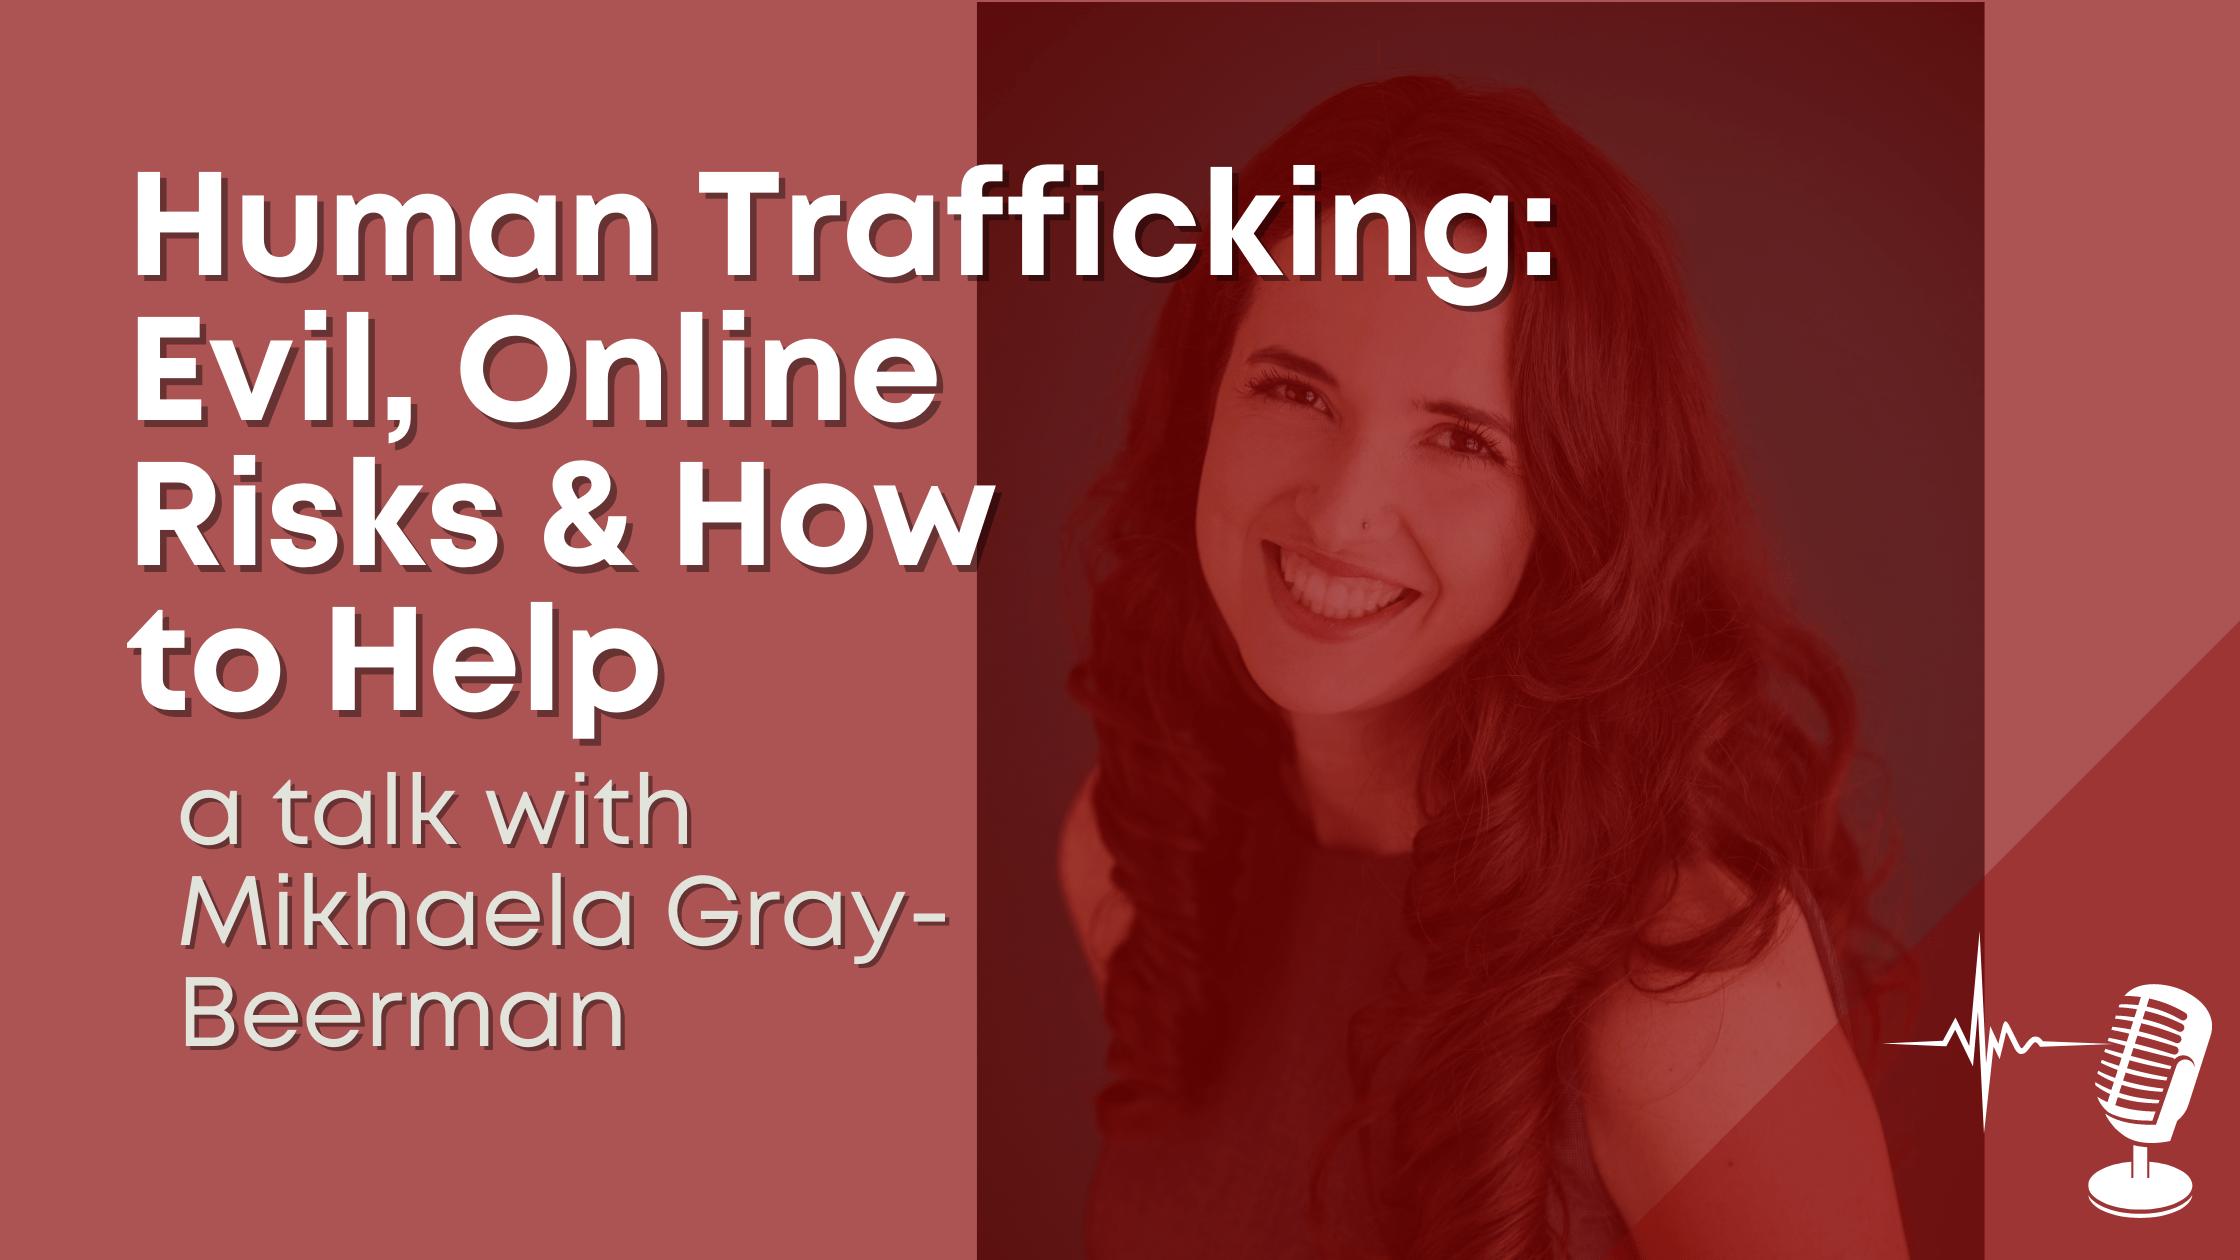 Human trafficking: evil, online risks & how to help - a talk witih Mikhaela Gray-Beerman